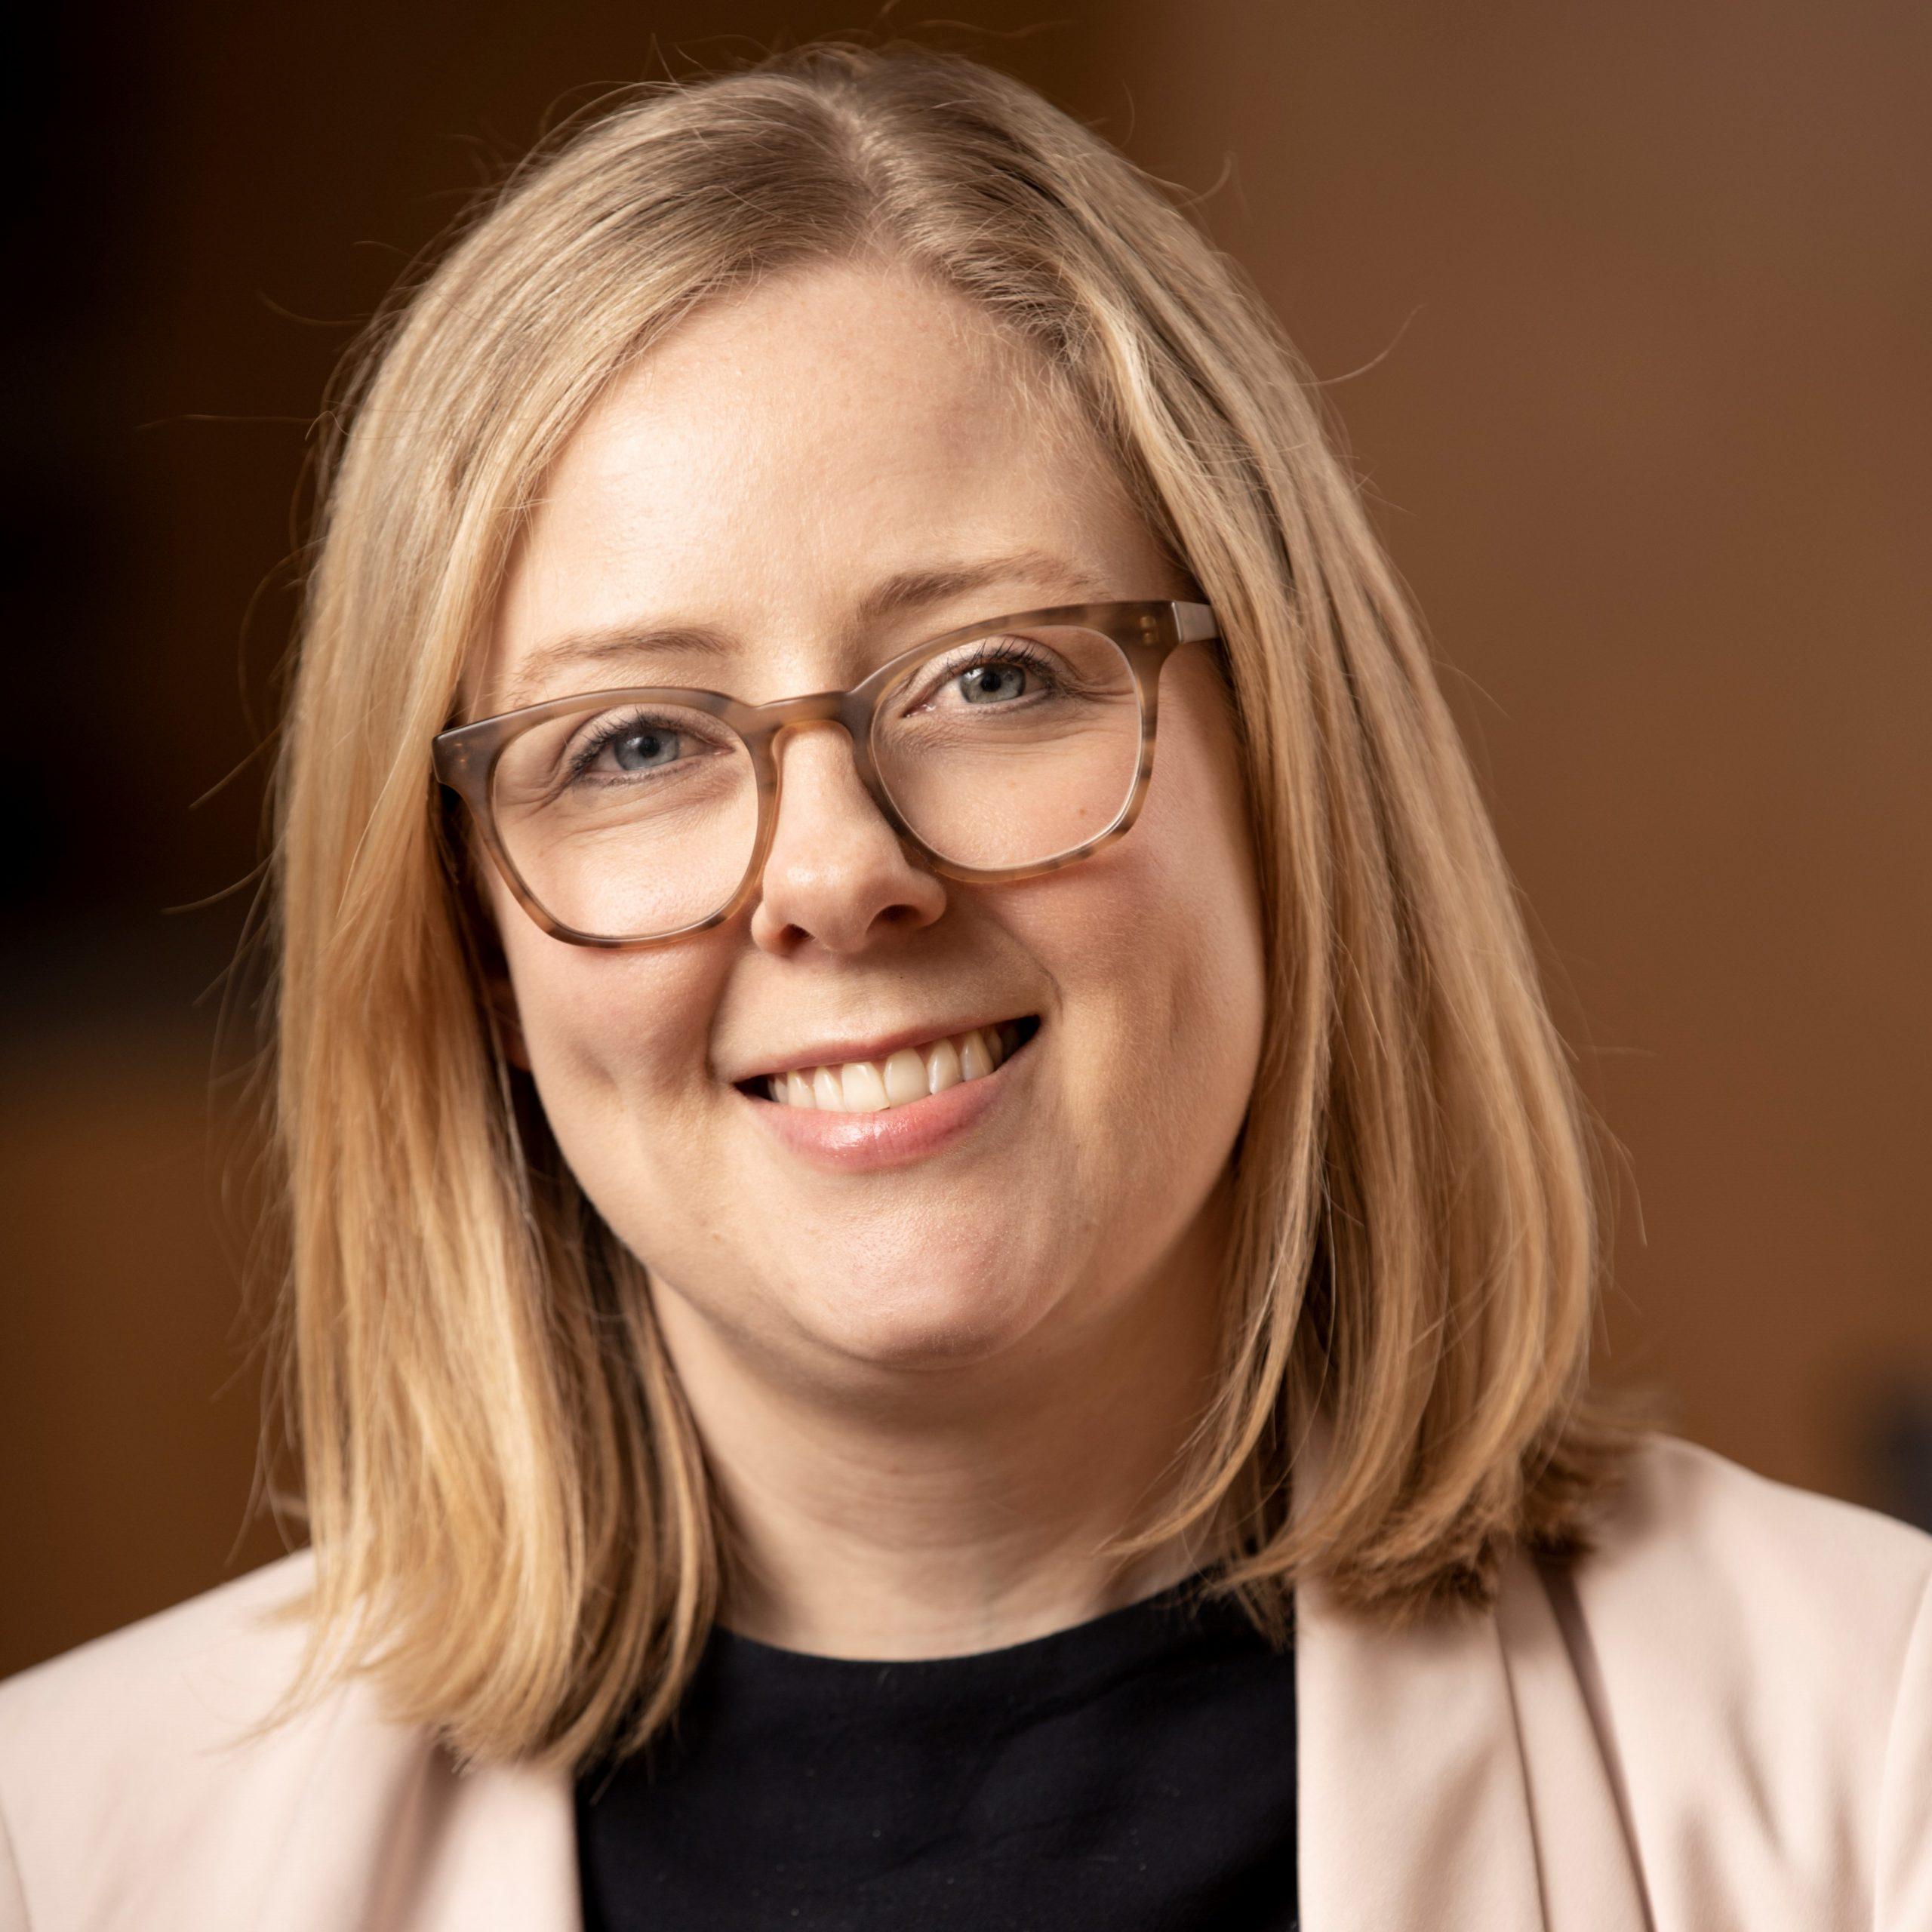 Anna Lindeman-Jones Headshot